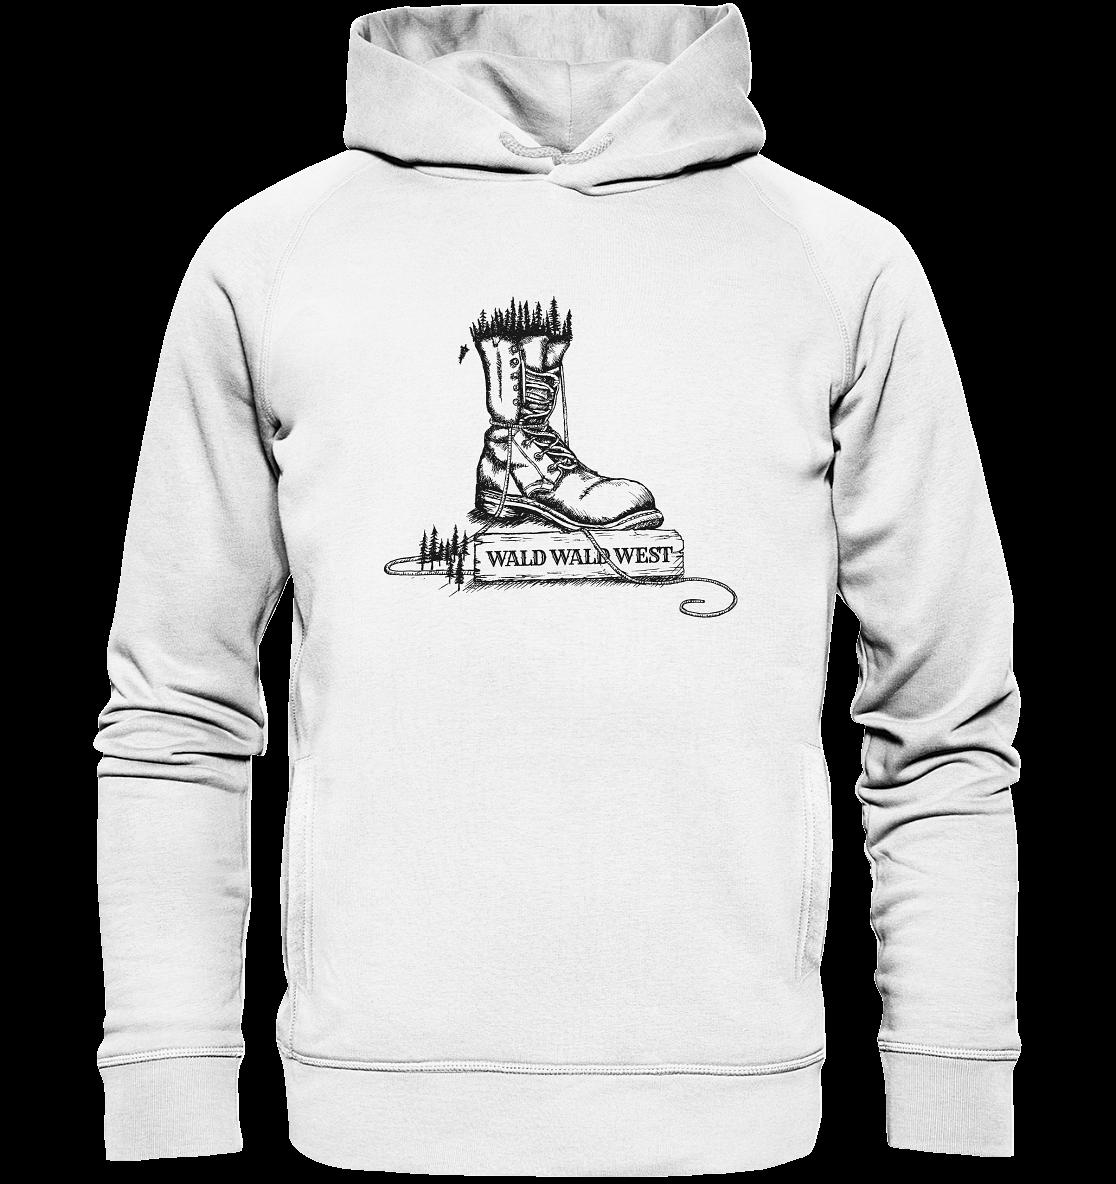 front-organic-fashion-hoodie-f8f8f8-1116x.png